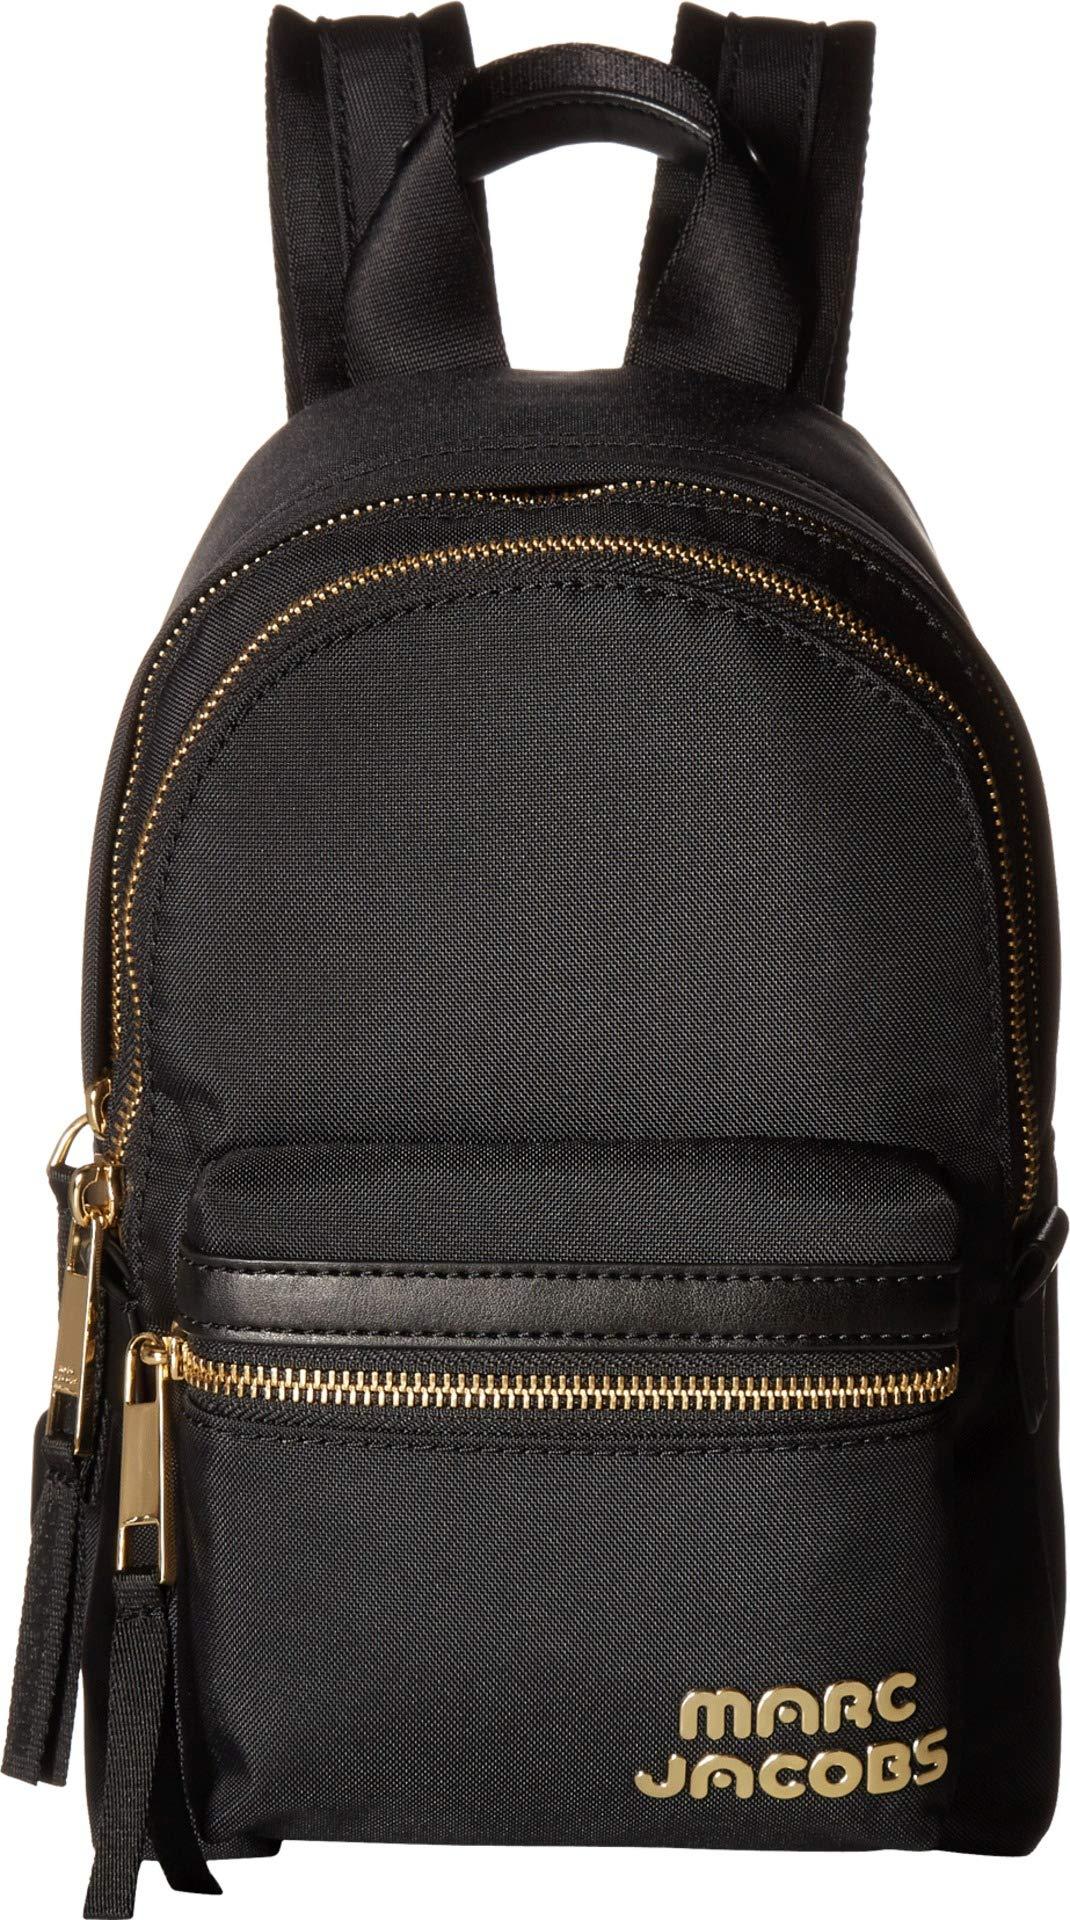 Marc Jacobs Women's Mini Backpack, Black, One Size